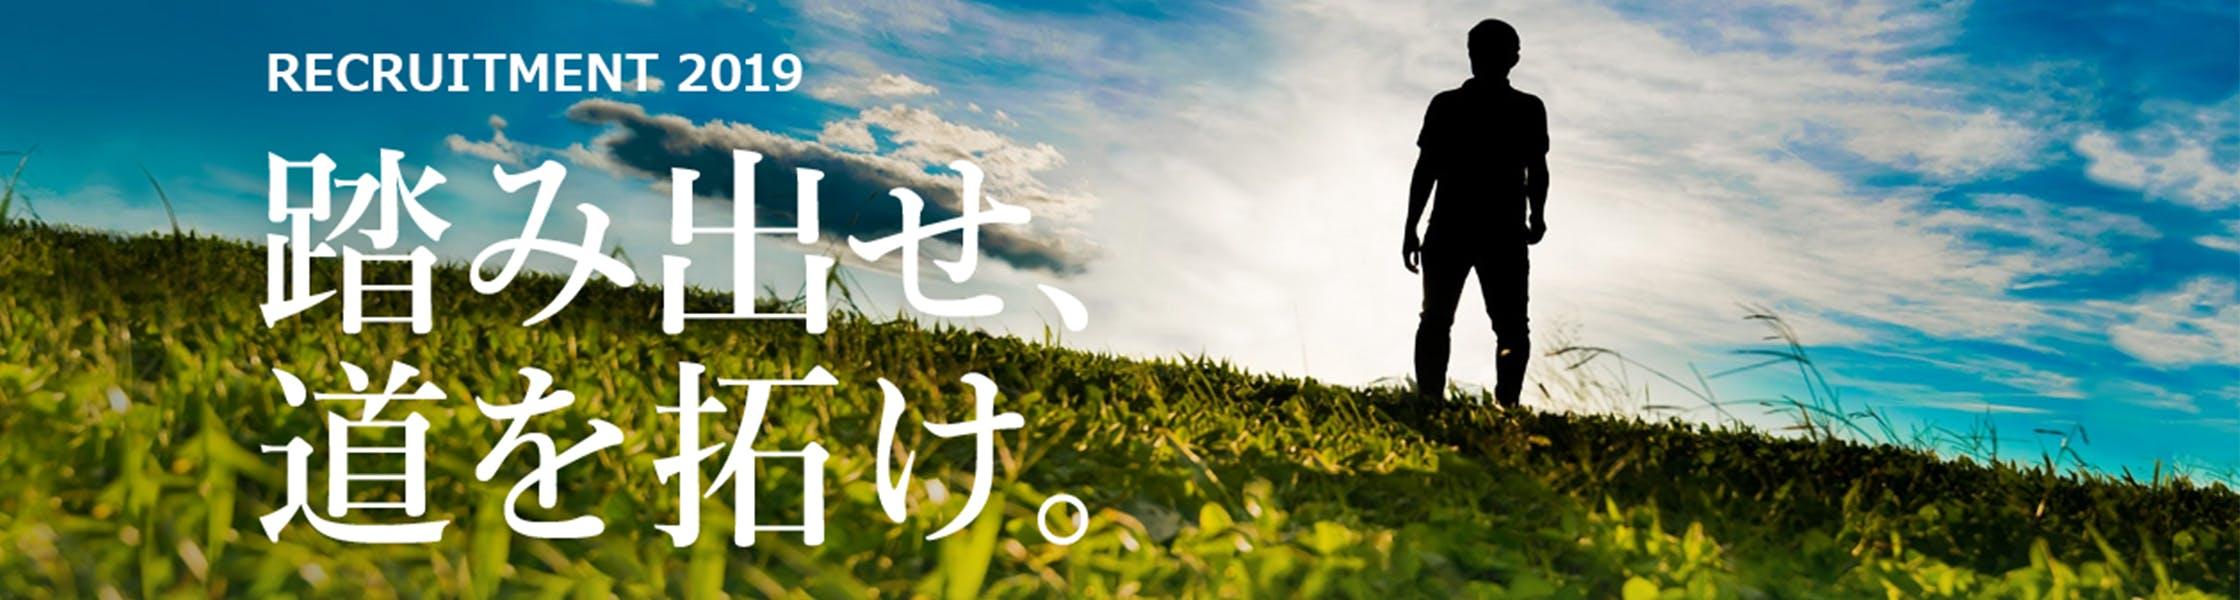 Fujifilm 1120x300 2x.jpg?ixlib=rails 3.0